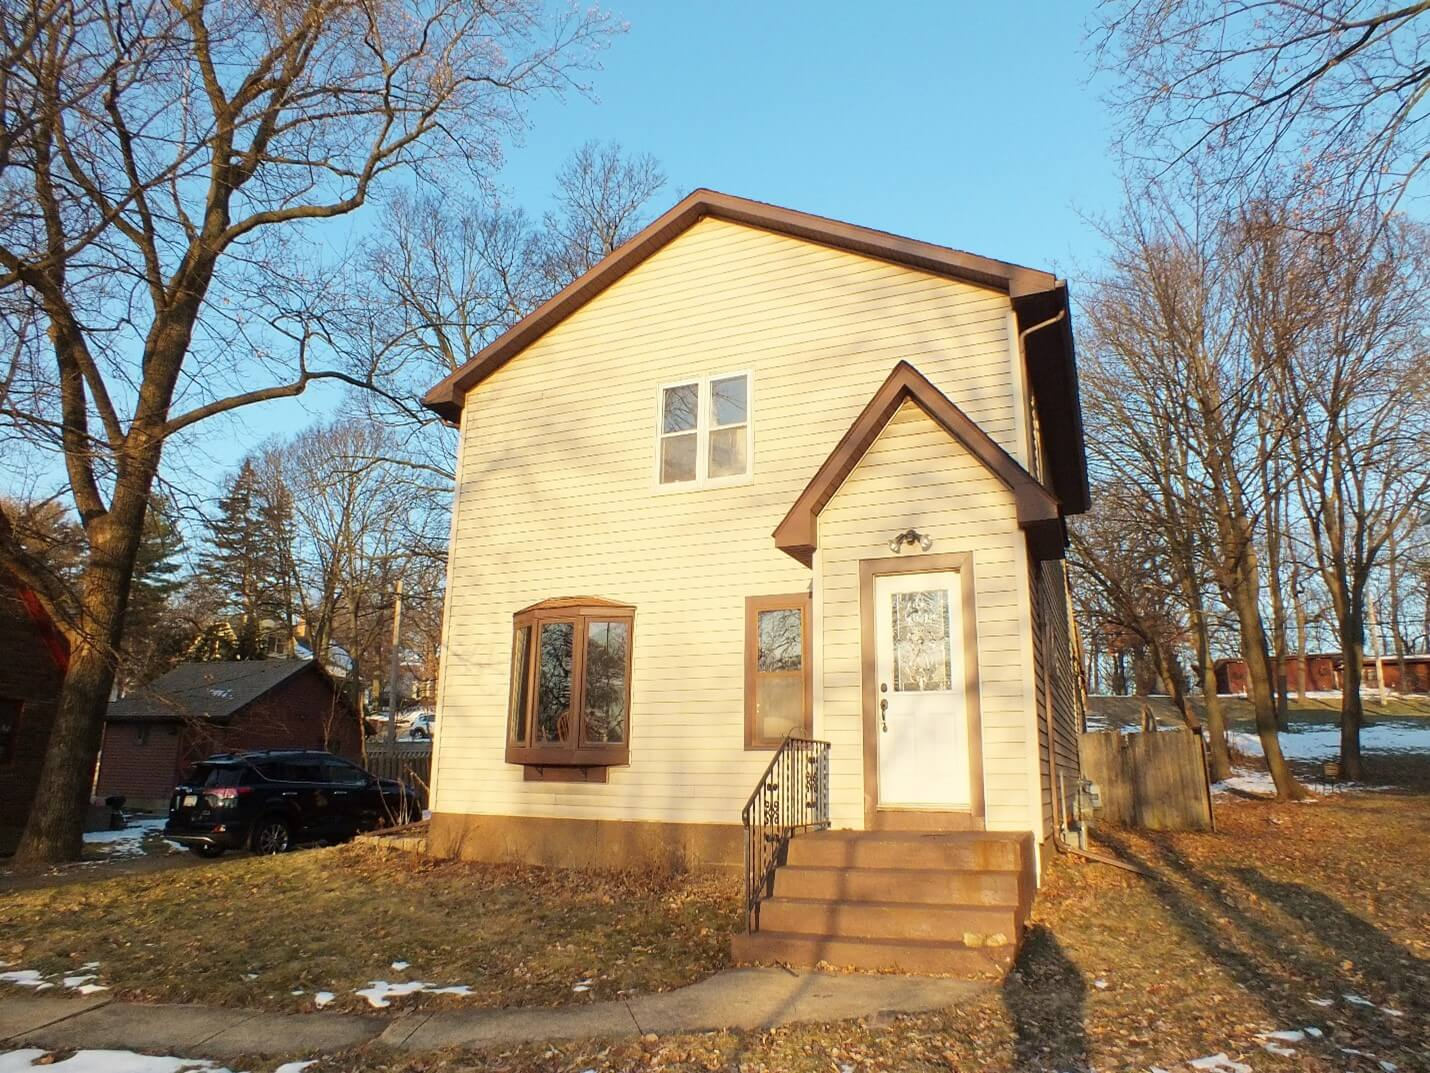 3366 E Washington Ave, Madison, WI – Sold by Alvarado Real Estate Group